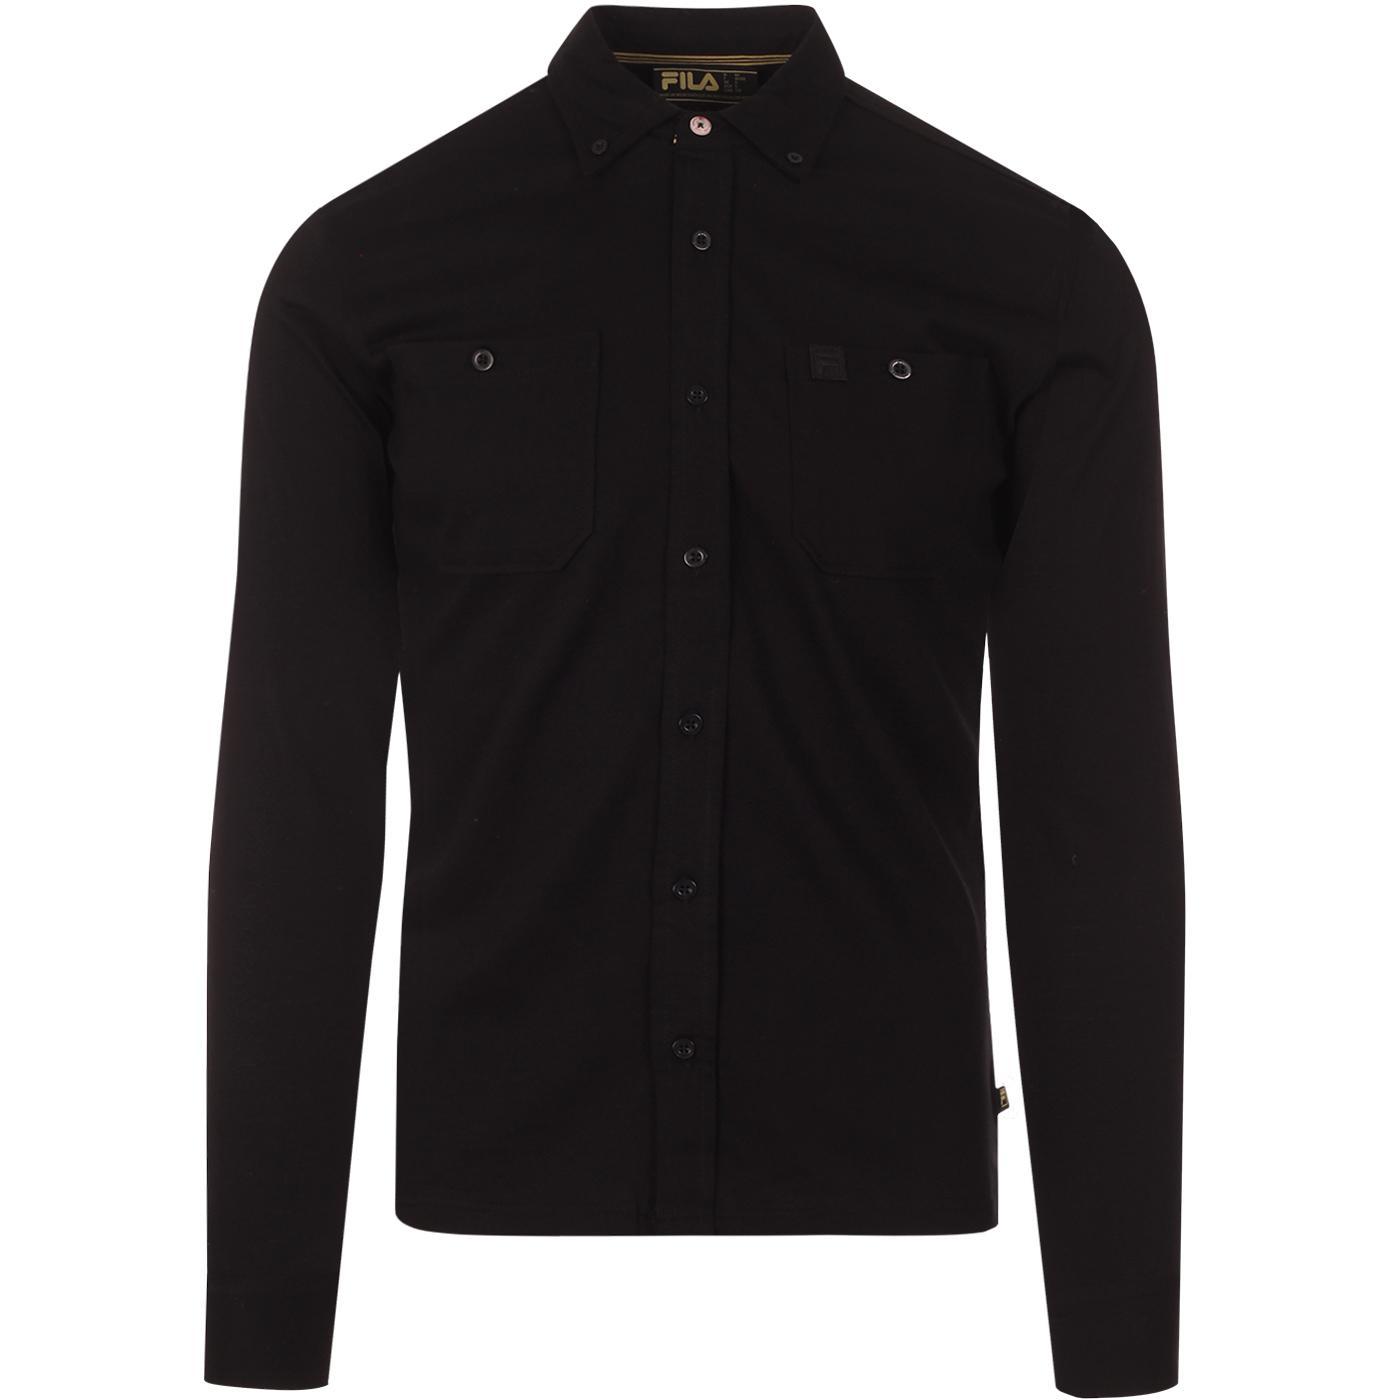 Dusio FILA VINTAGE Button Down Mod Jersey Shirt